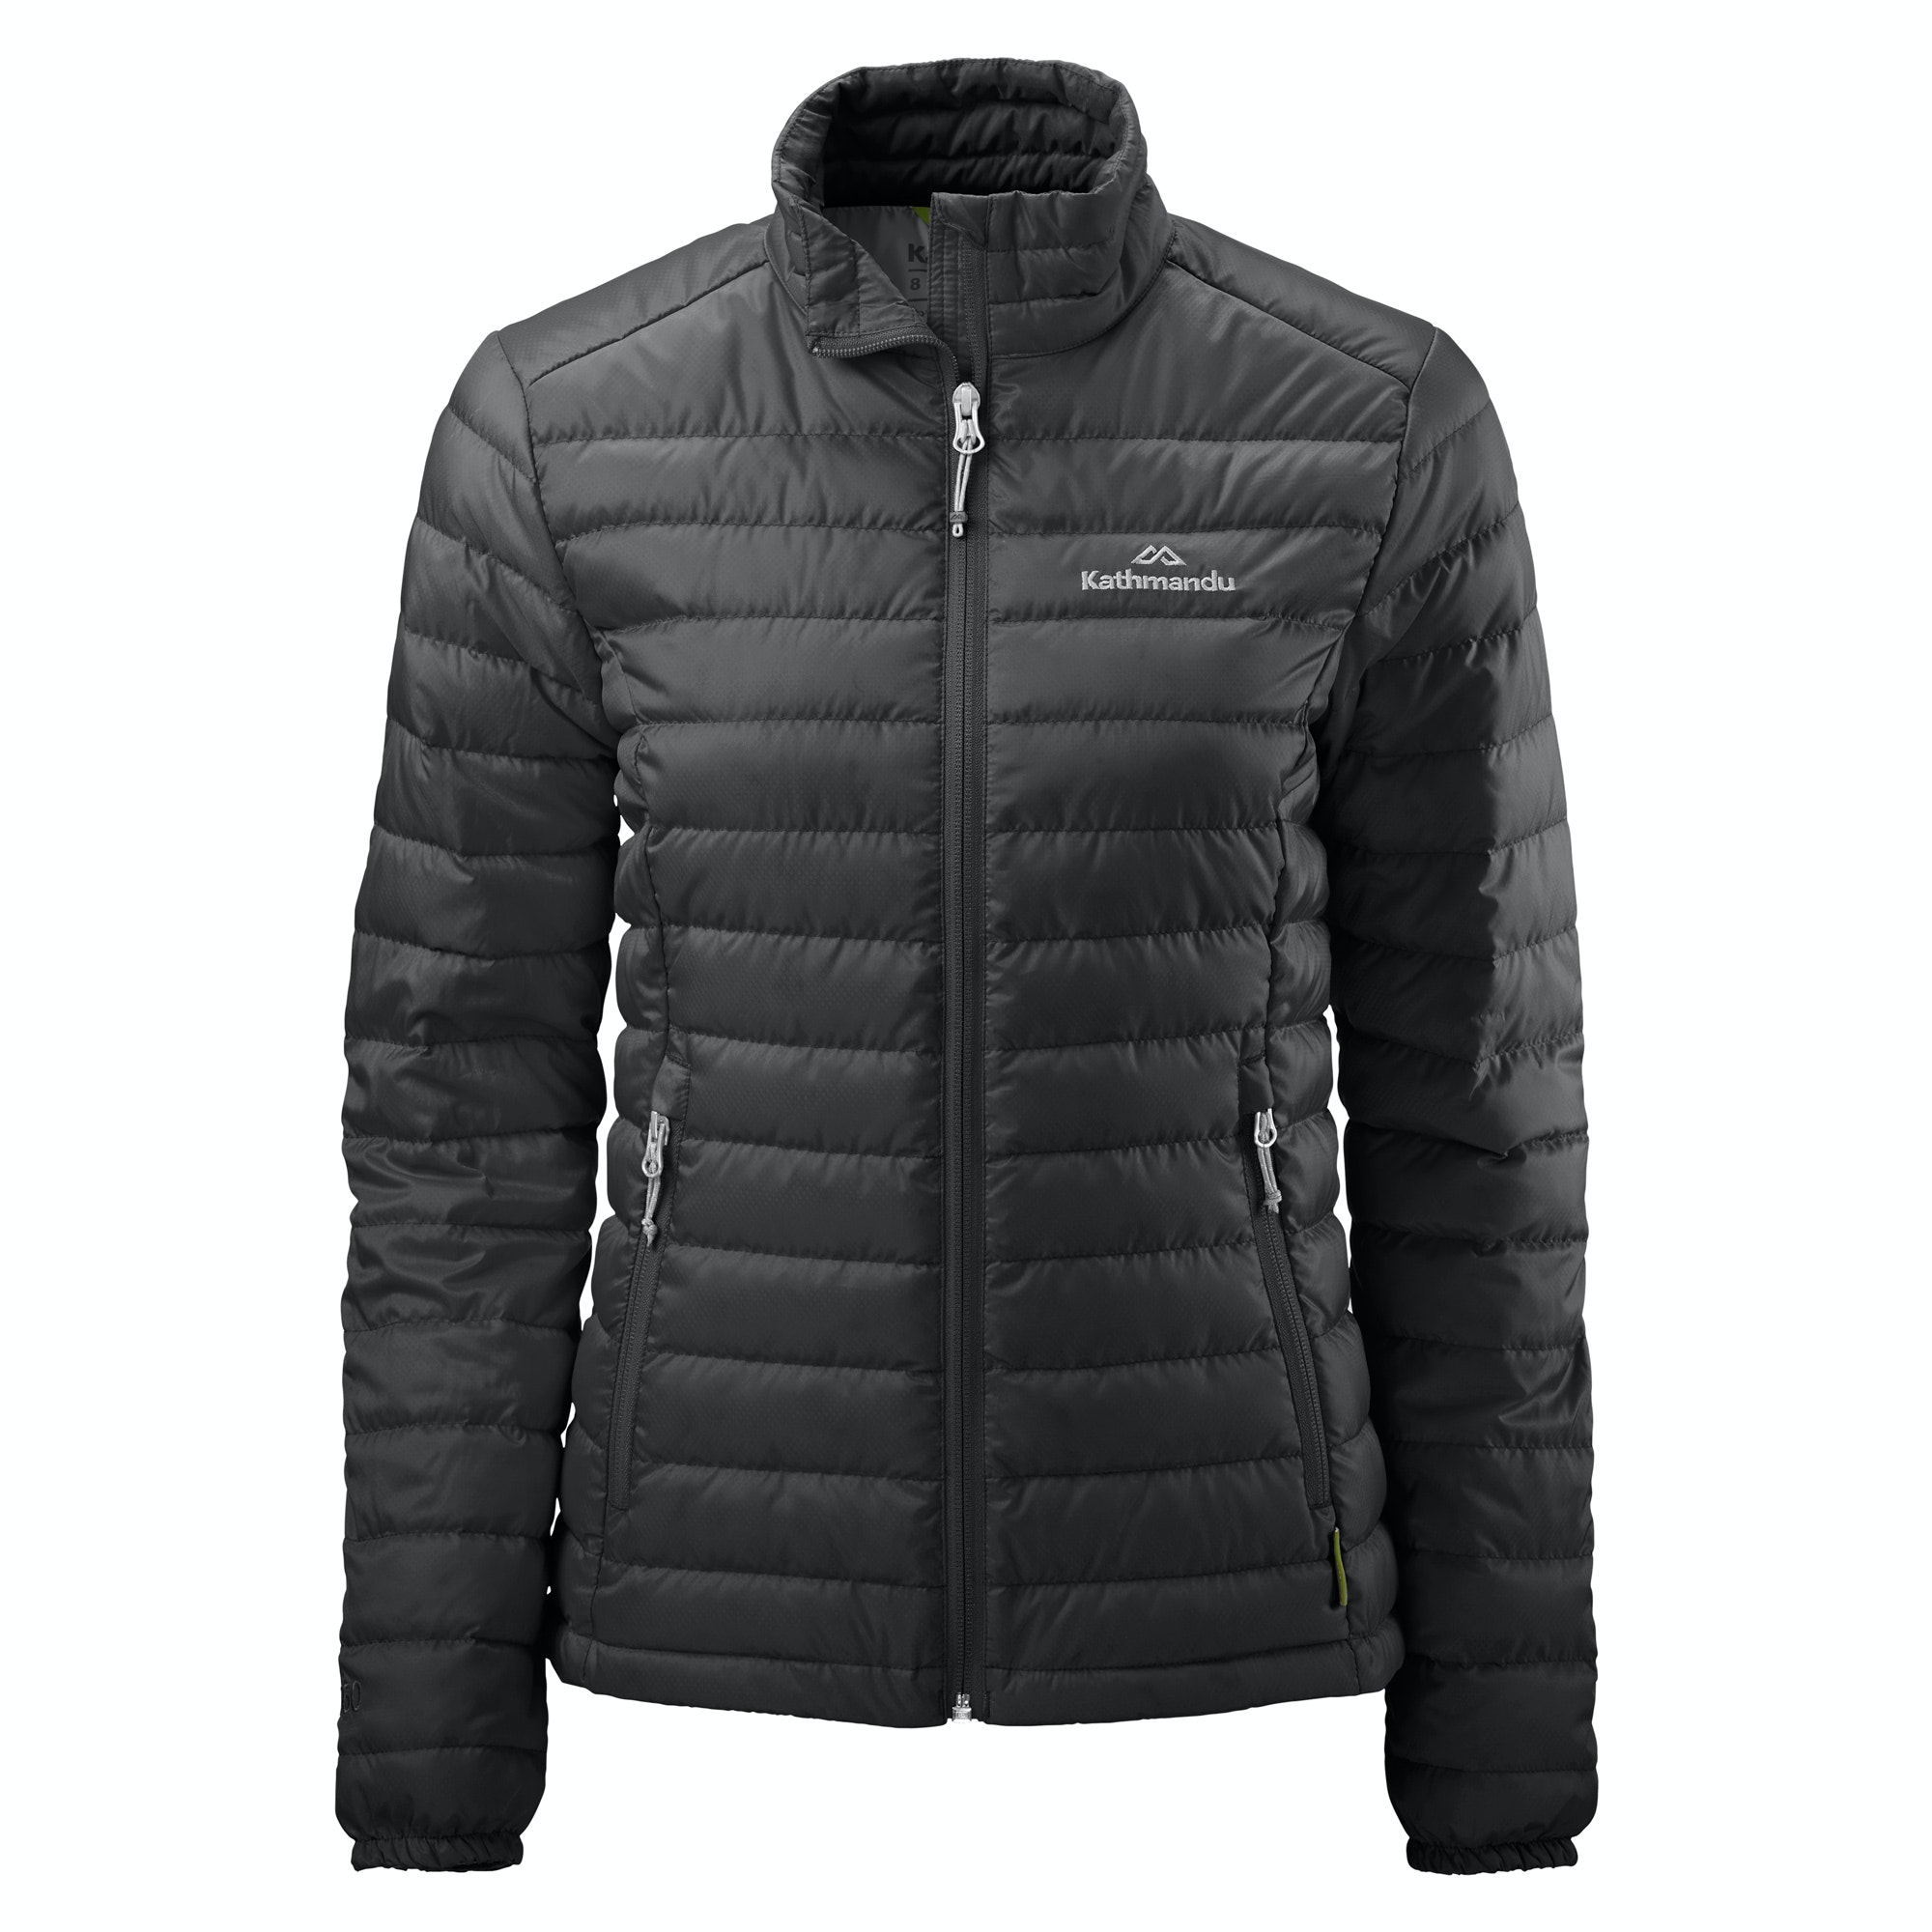 New Suit Coat Dress Storage Garment Carrier Bag Travel Cover Clearance Sales